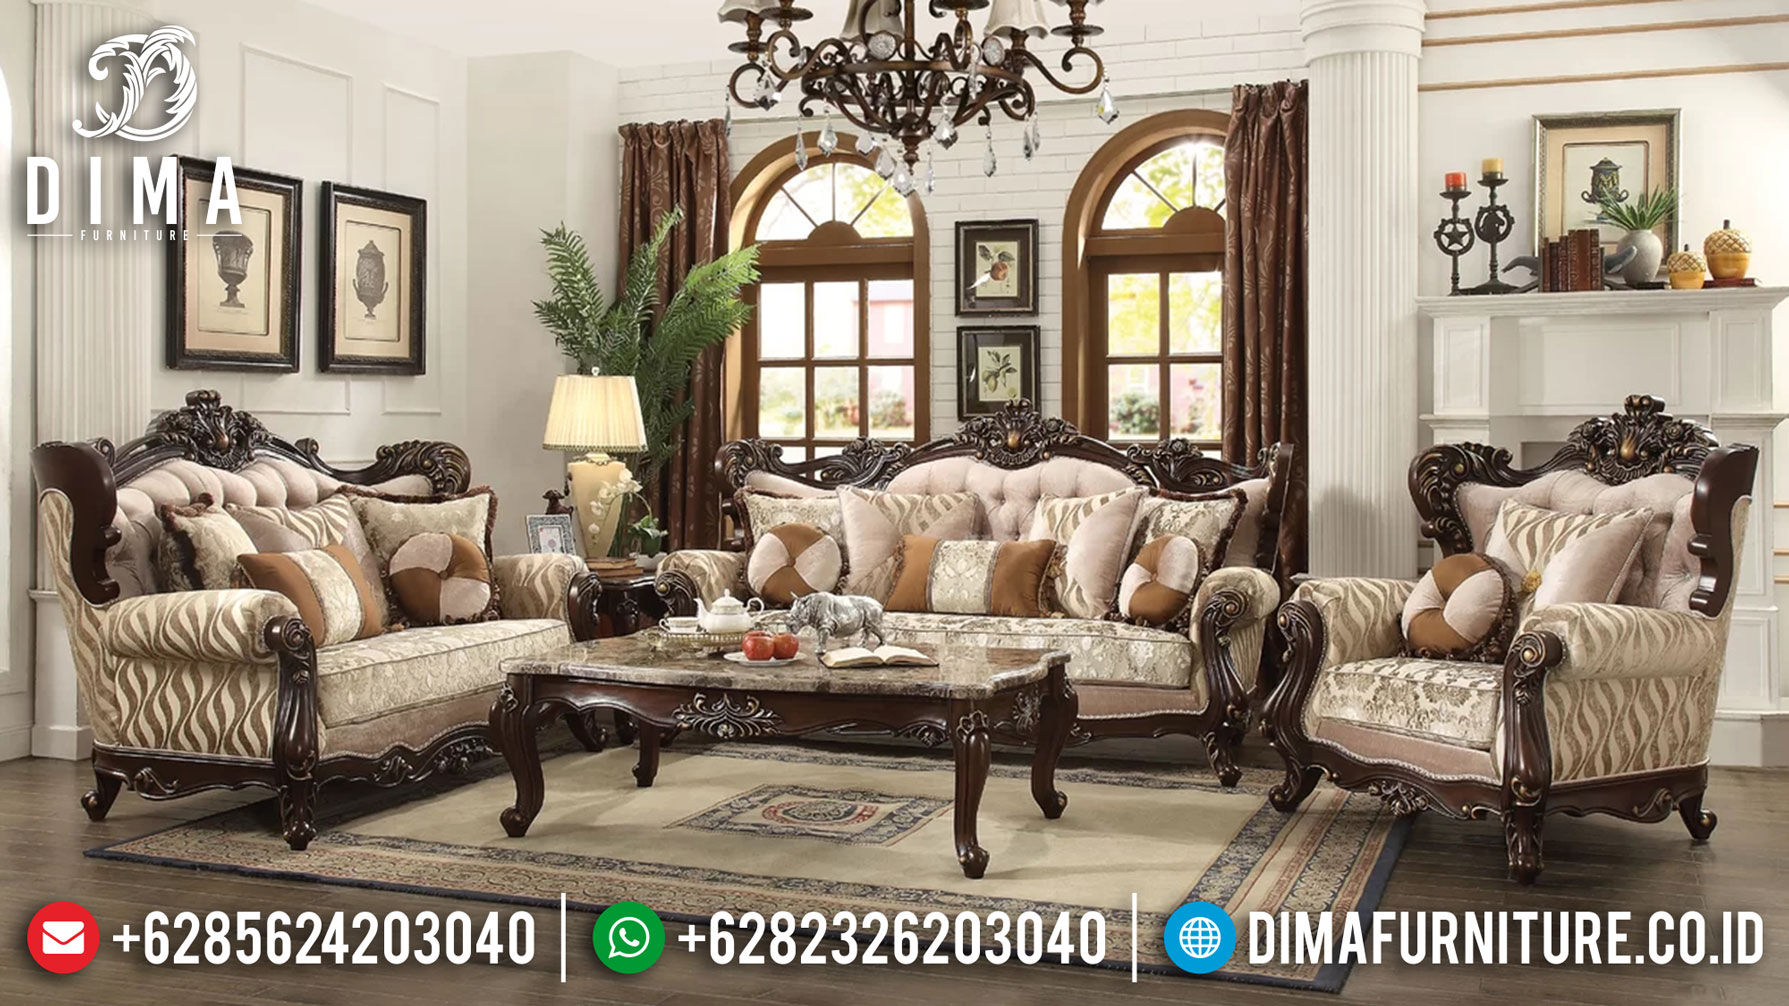 Set Sofa Tamu Mewah Ukiran Klasik Furniture Jepara Terbaru Luxury Style ST-0979